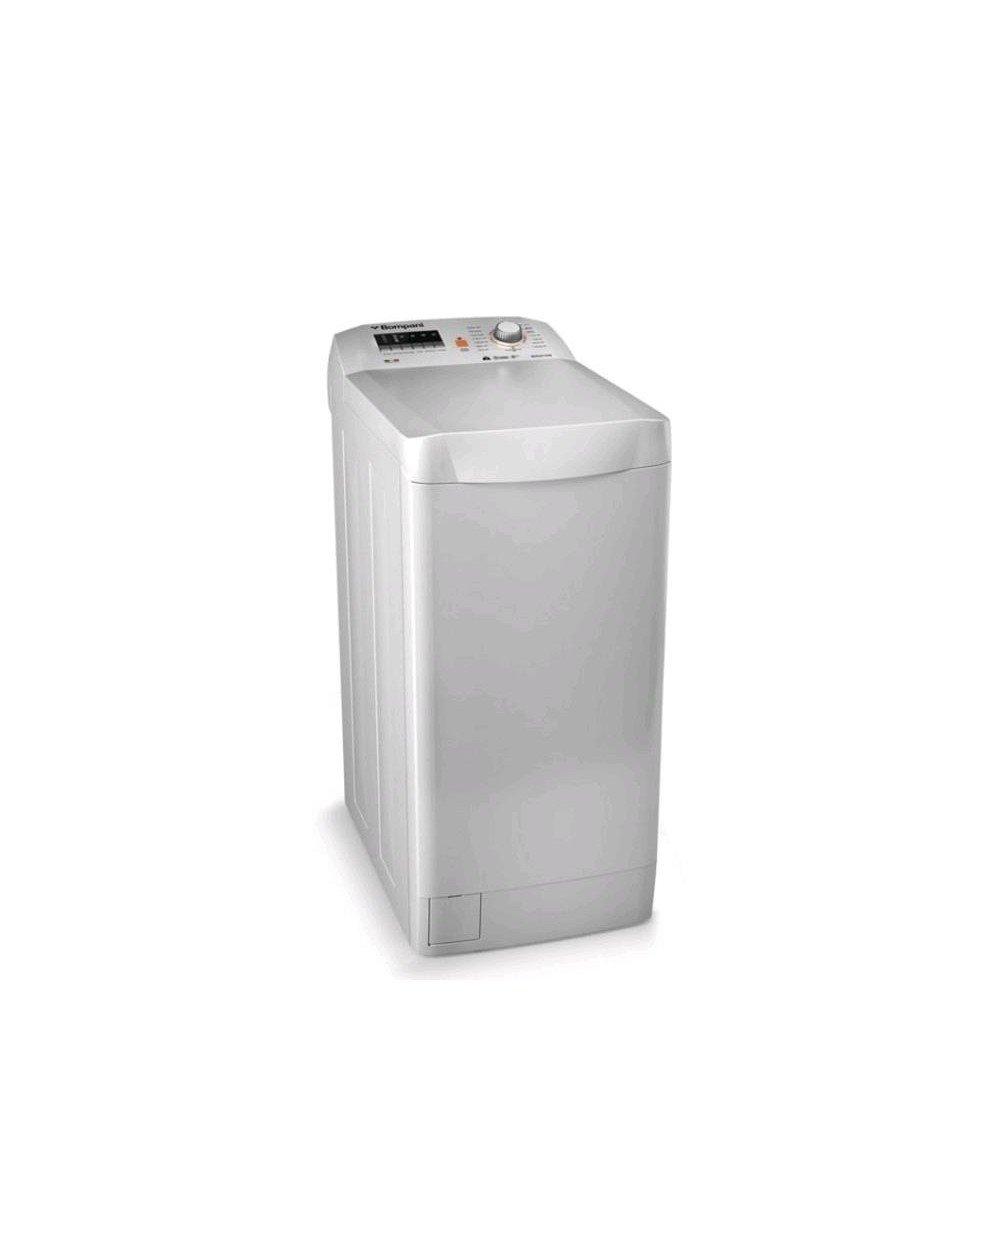 Lavadora electrónica Carga Superior Bompani boca814: Amazon.es ...